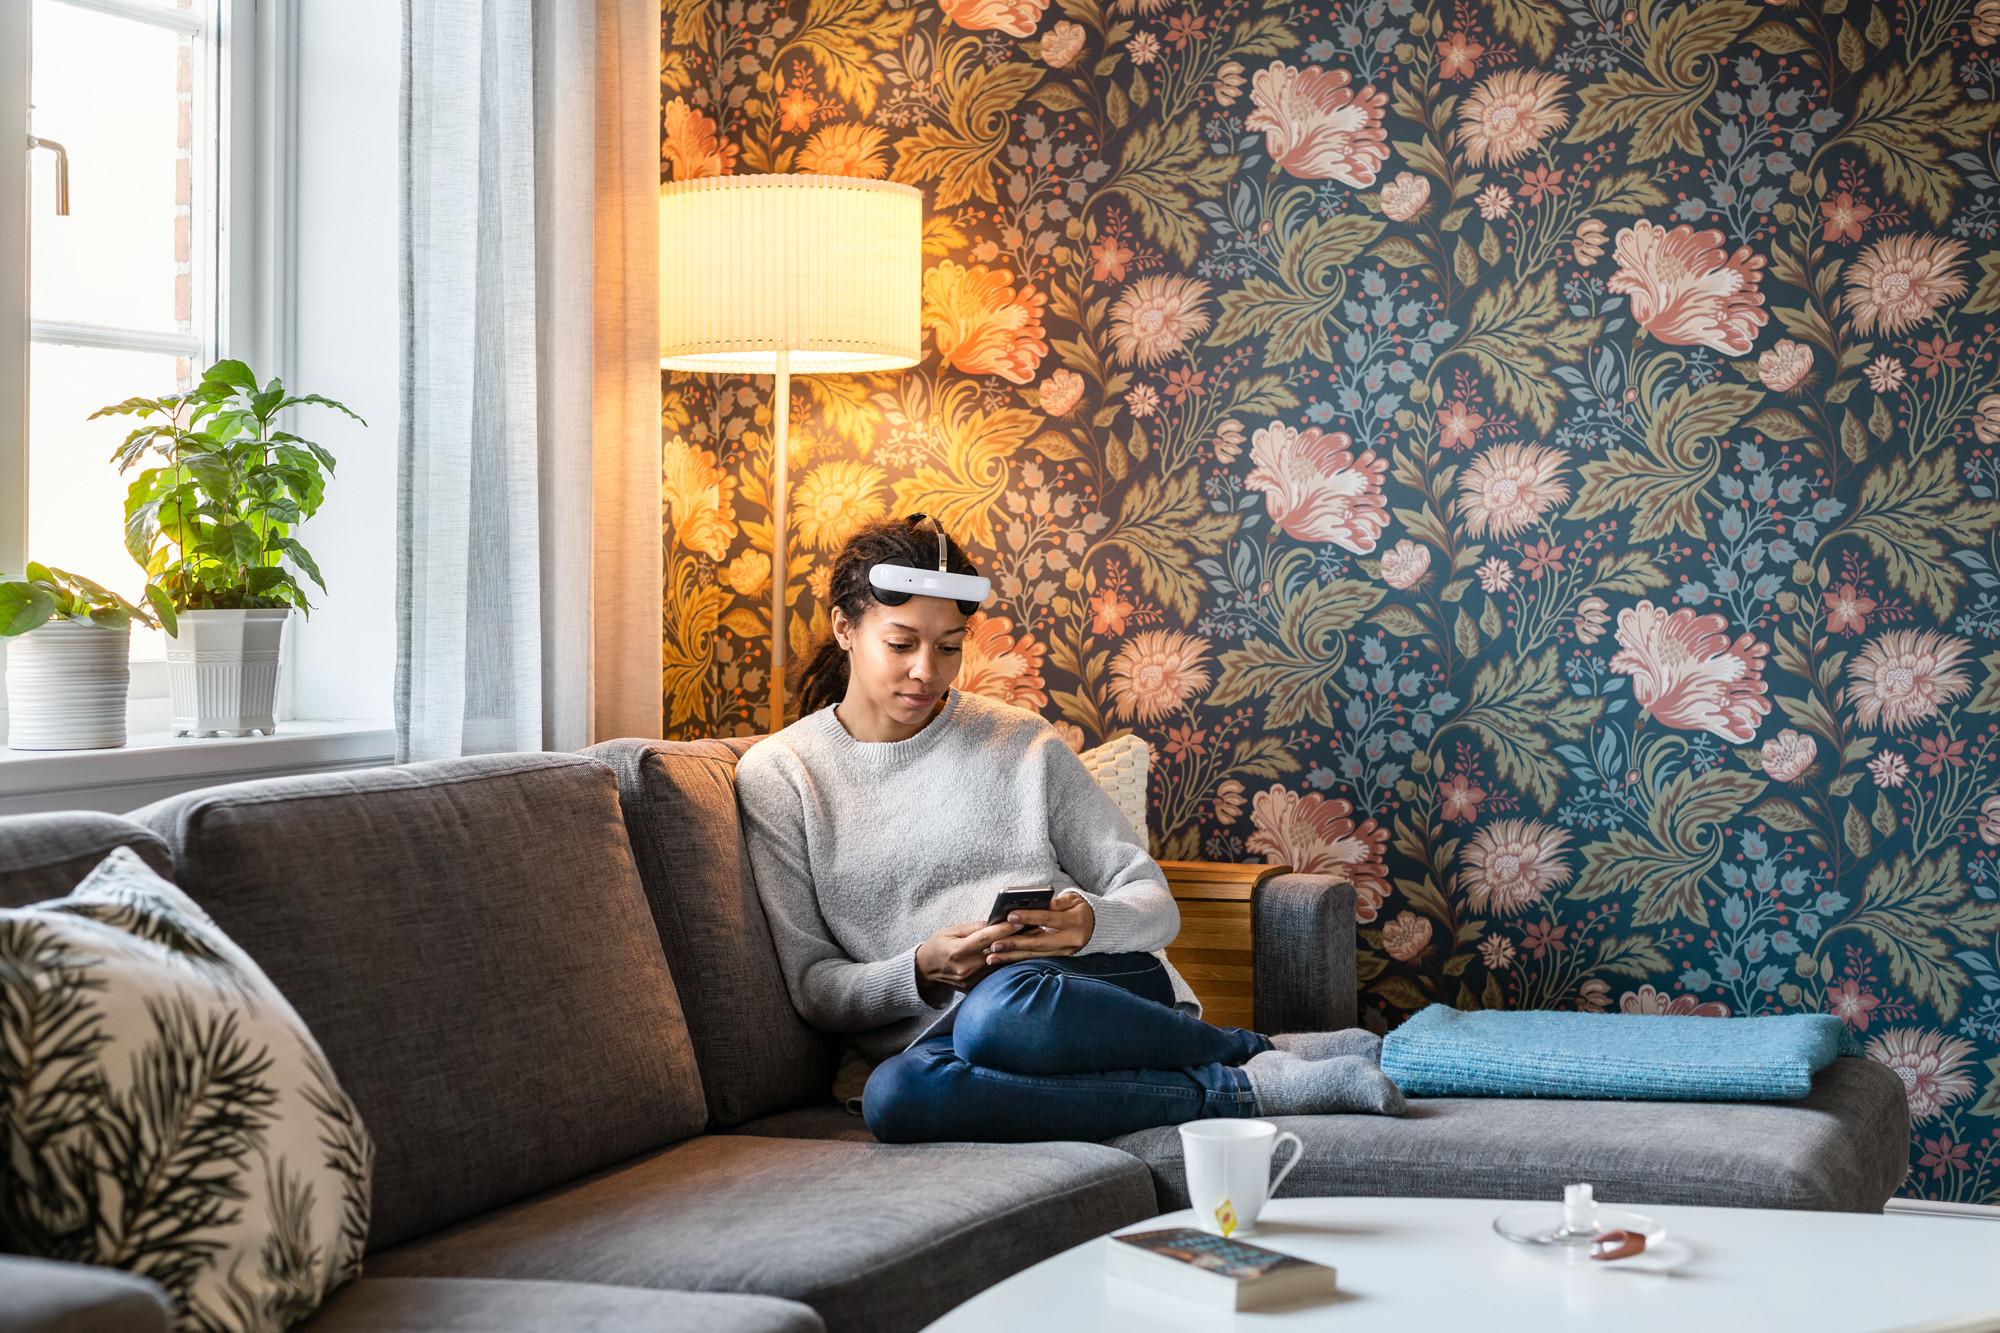 Behandla din depression i hemmet - med ny medicinfri depressionsbehandling